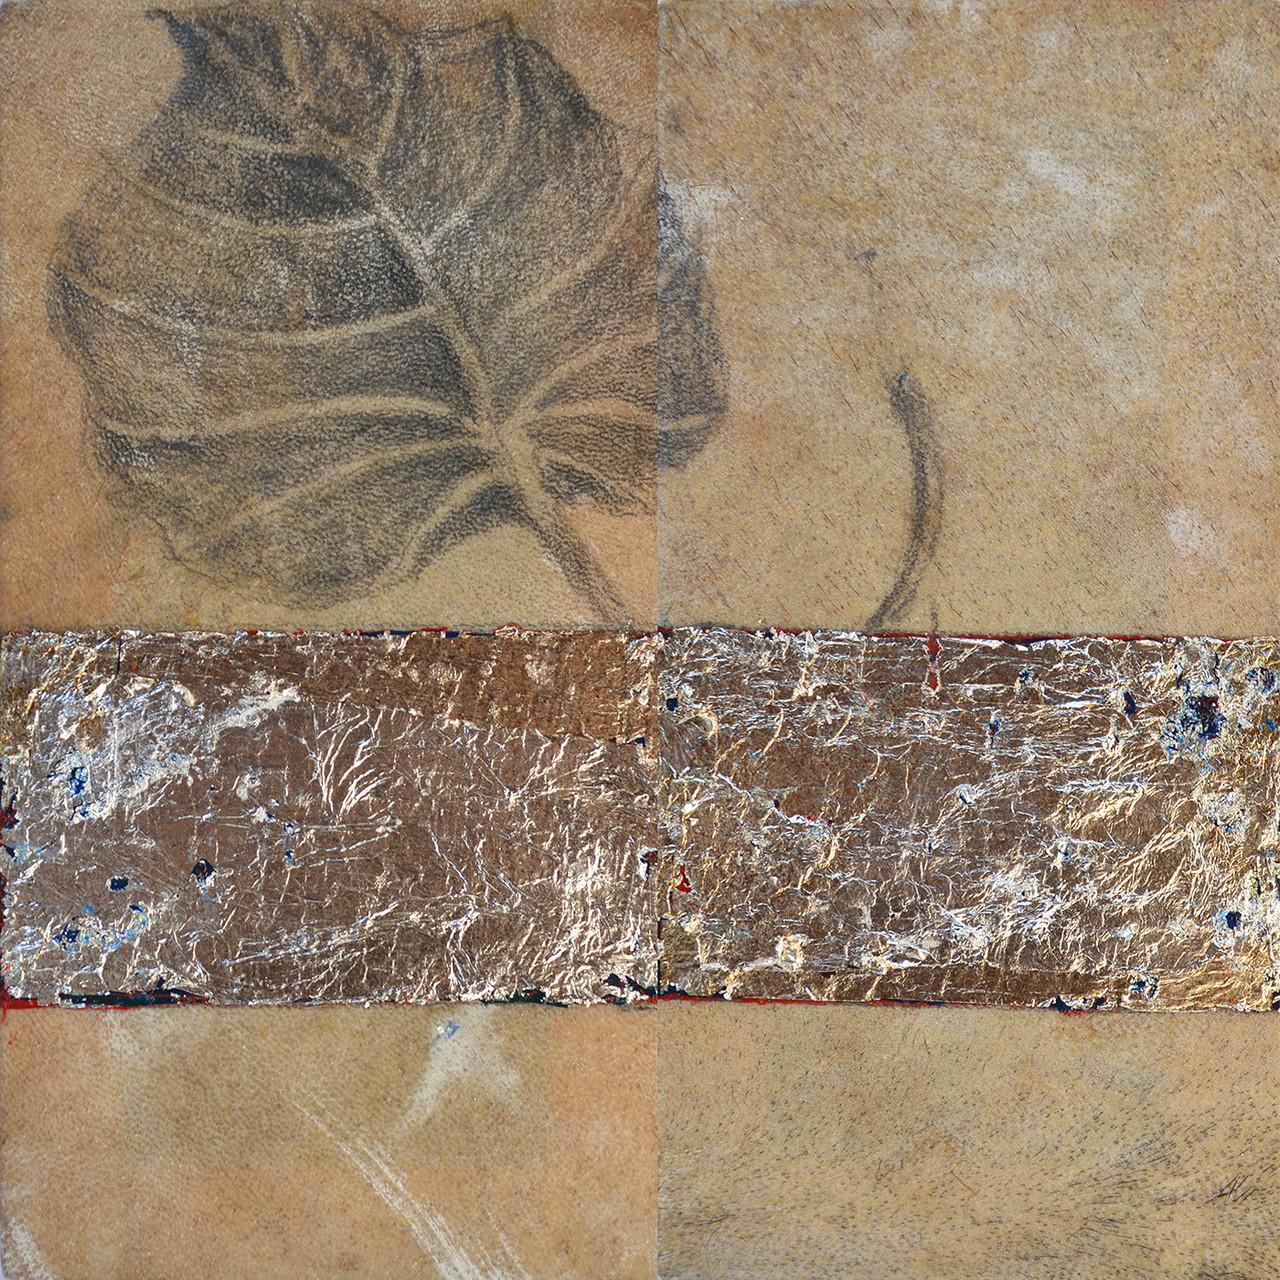 Título: Hoja Triste  Técnica: Oleo, grafito y hoja de plata/pergamino      Medidas: 20 x 20 cm